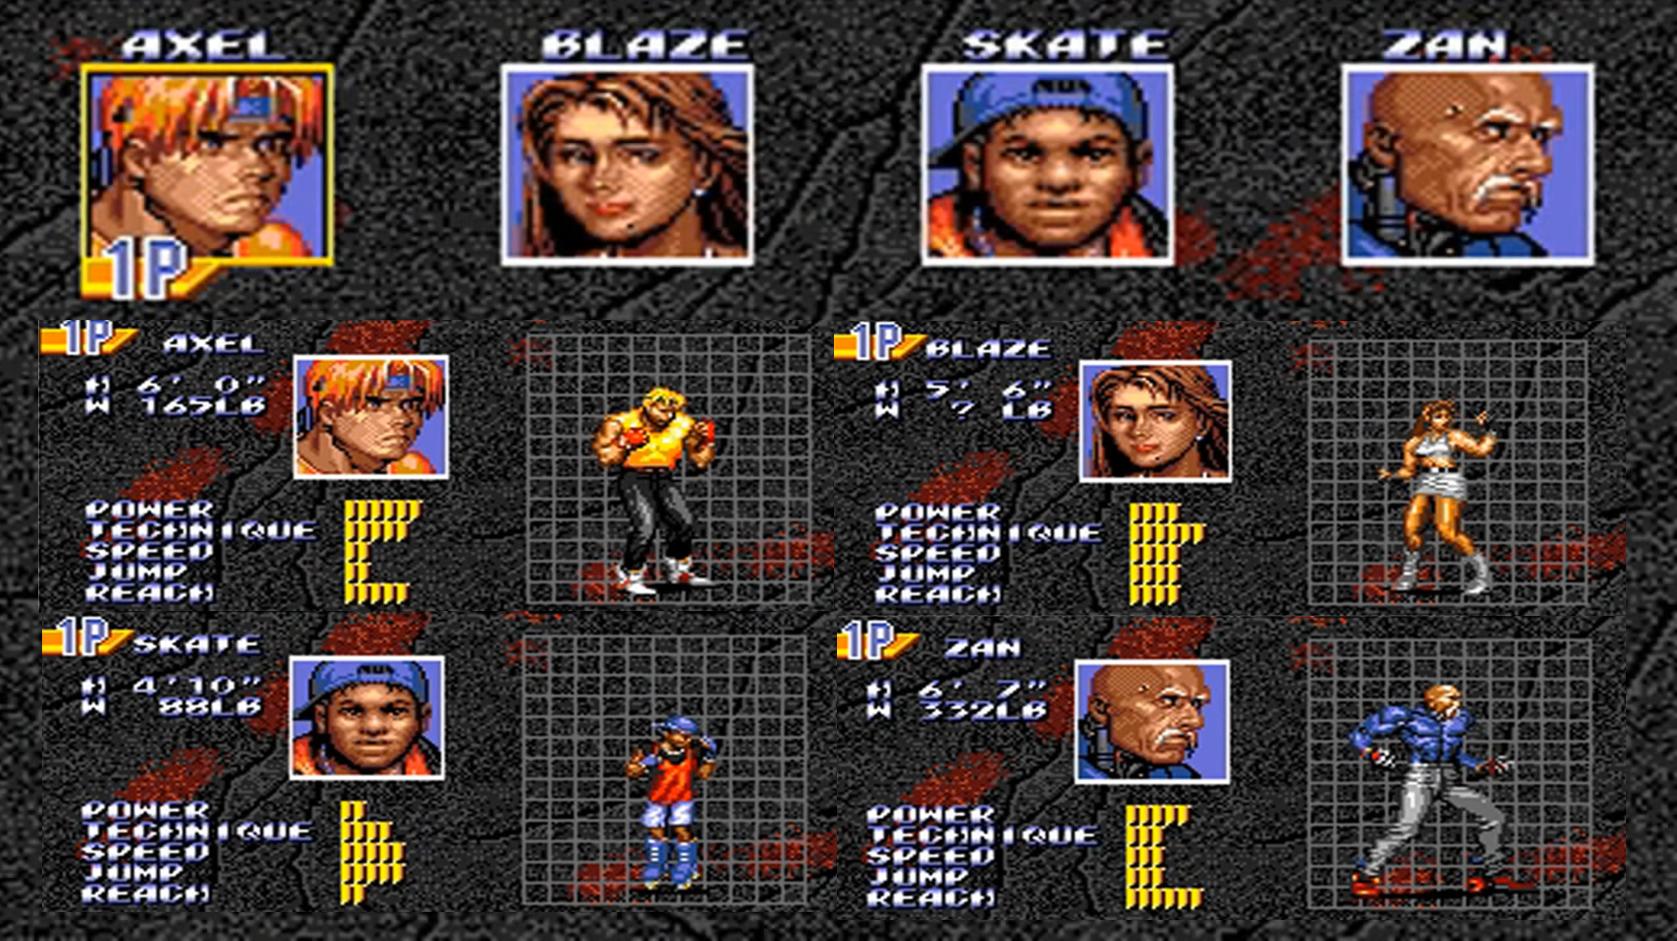 Resultado de imagem para street of rage 3 characters